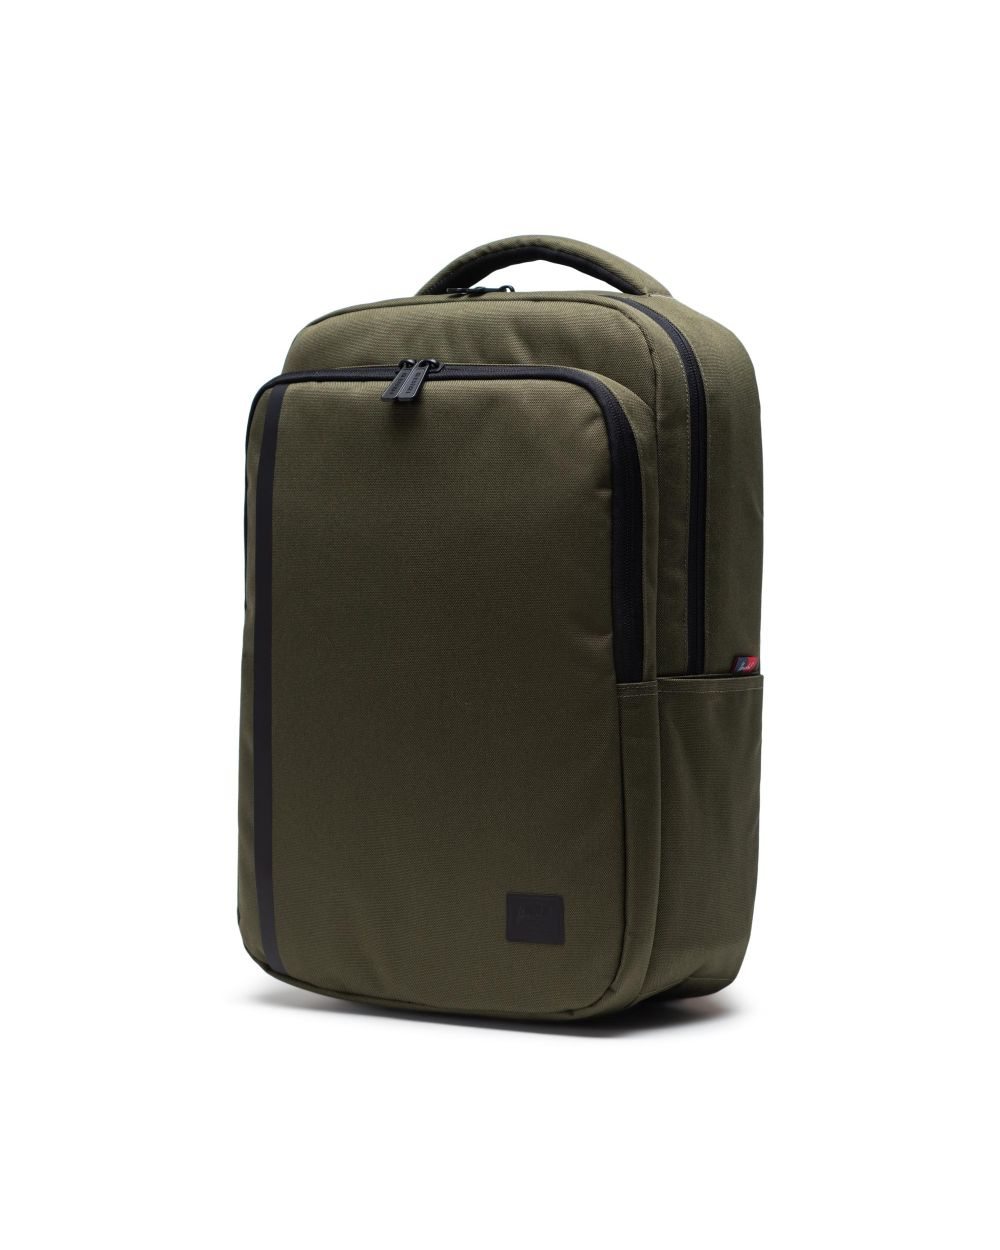 Herschel Tech Daypack, best laptop backpack